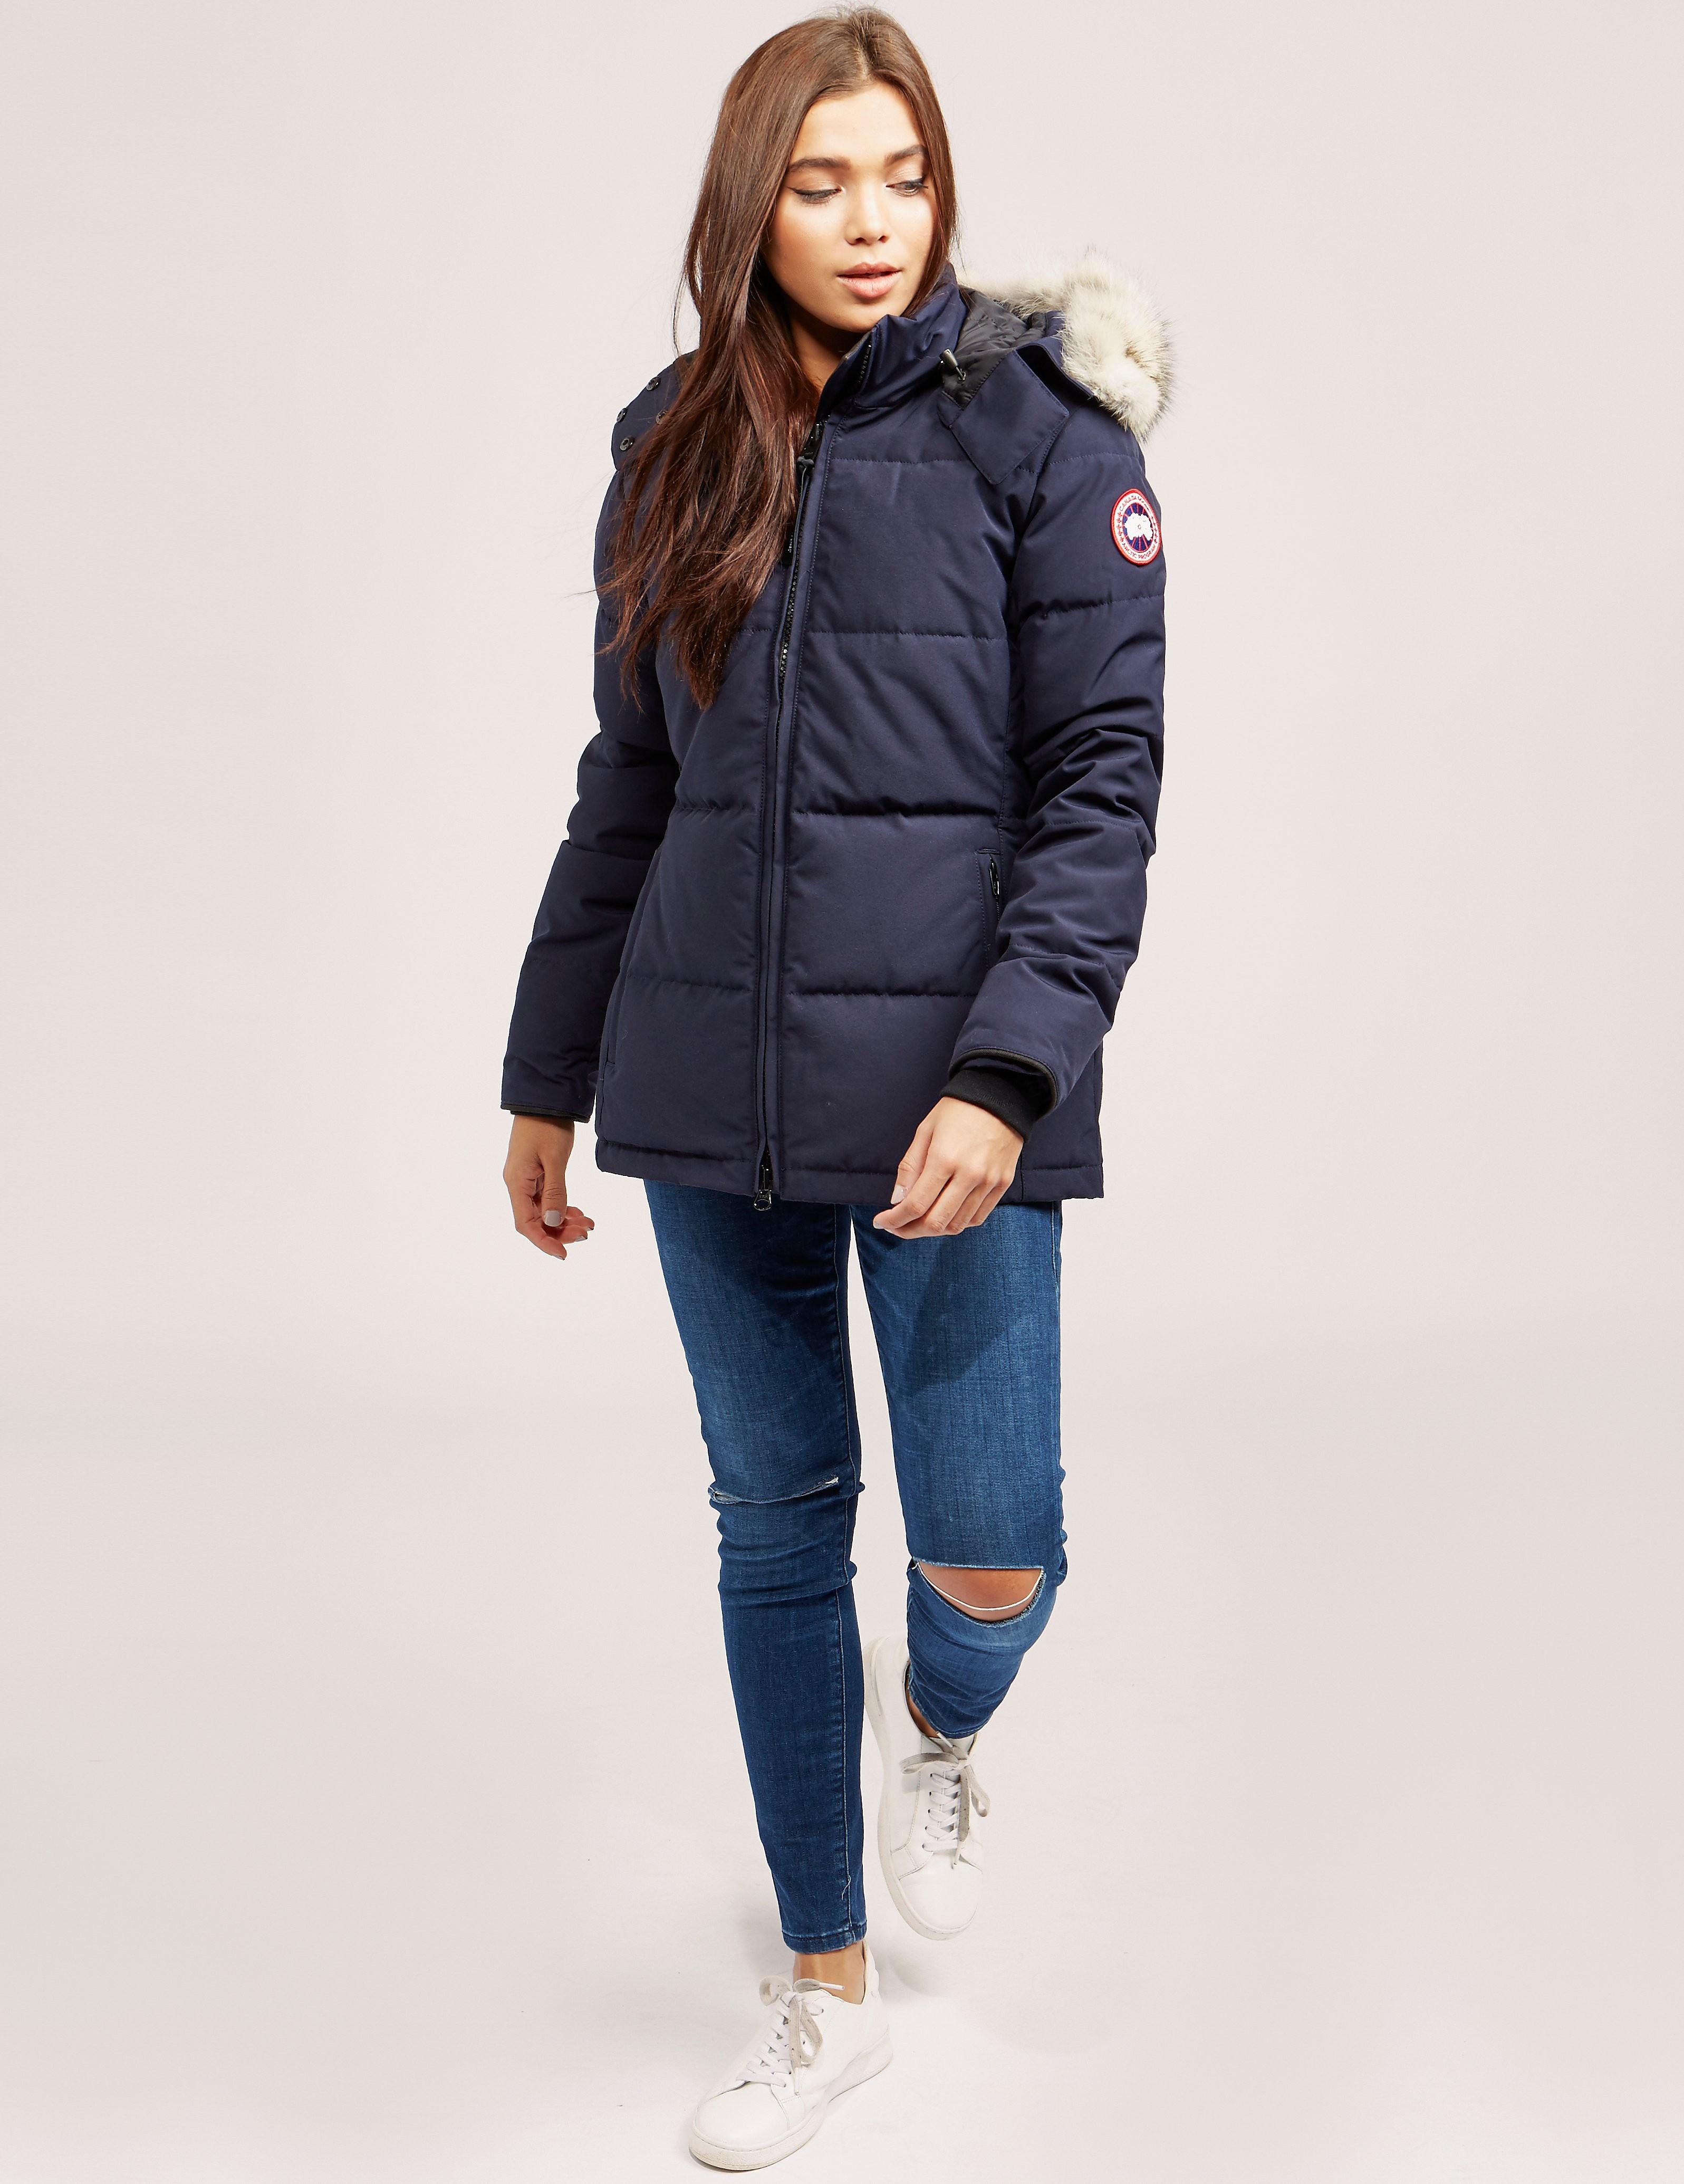 Canada Goose Chelsea Parka Jacket